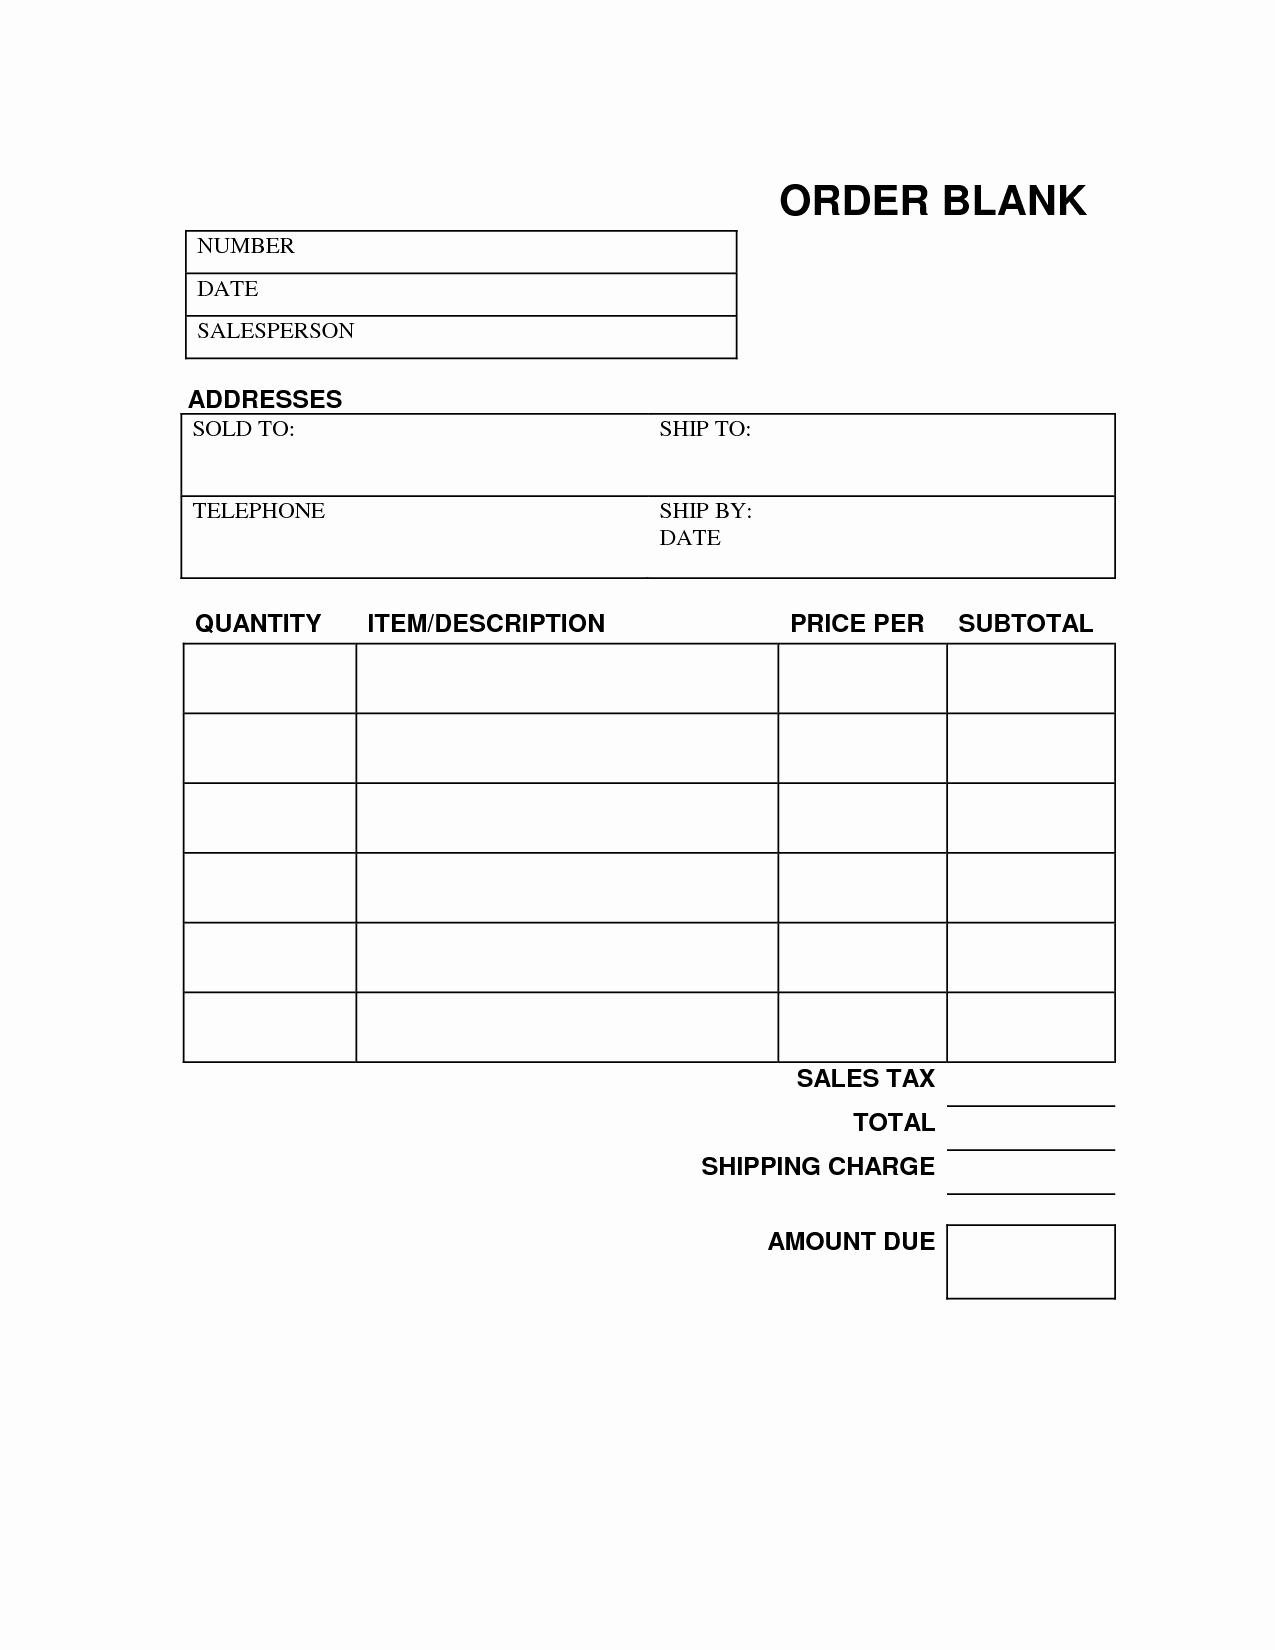 Blank Money order Template New Blank order form Printable